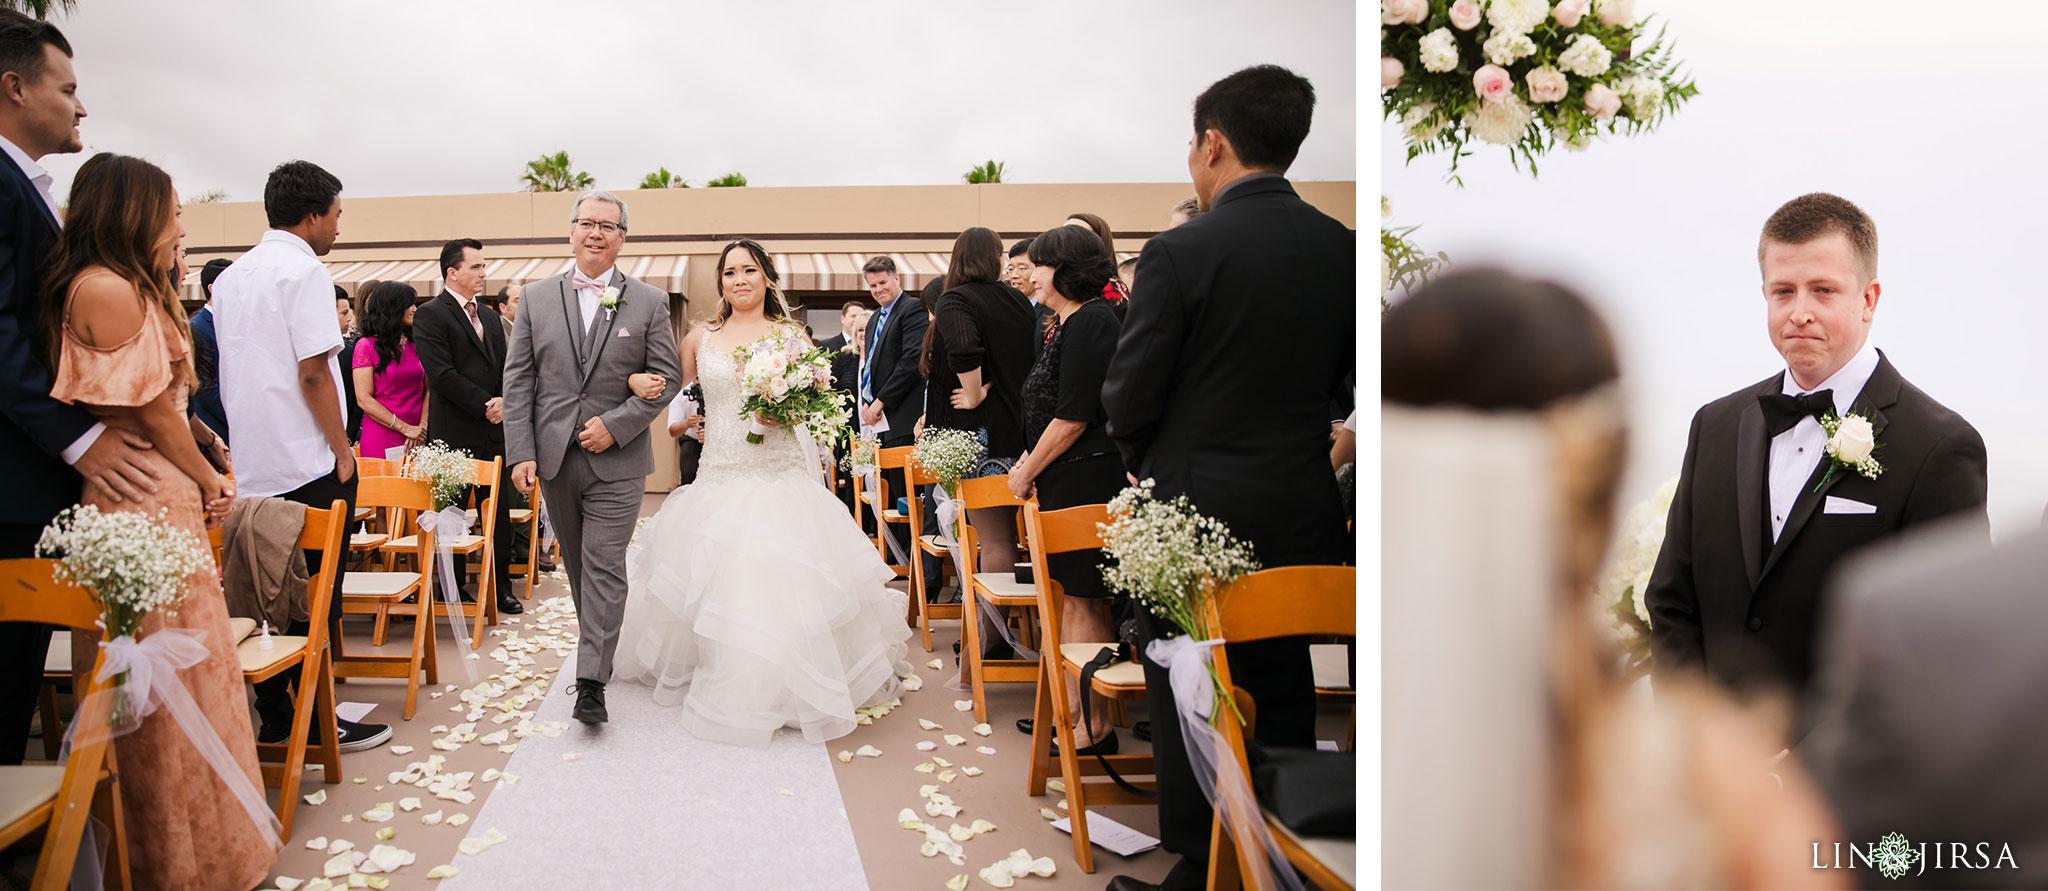 17 surf and sand resort laguna beach wedding ceremony photography